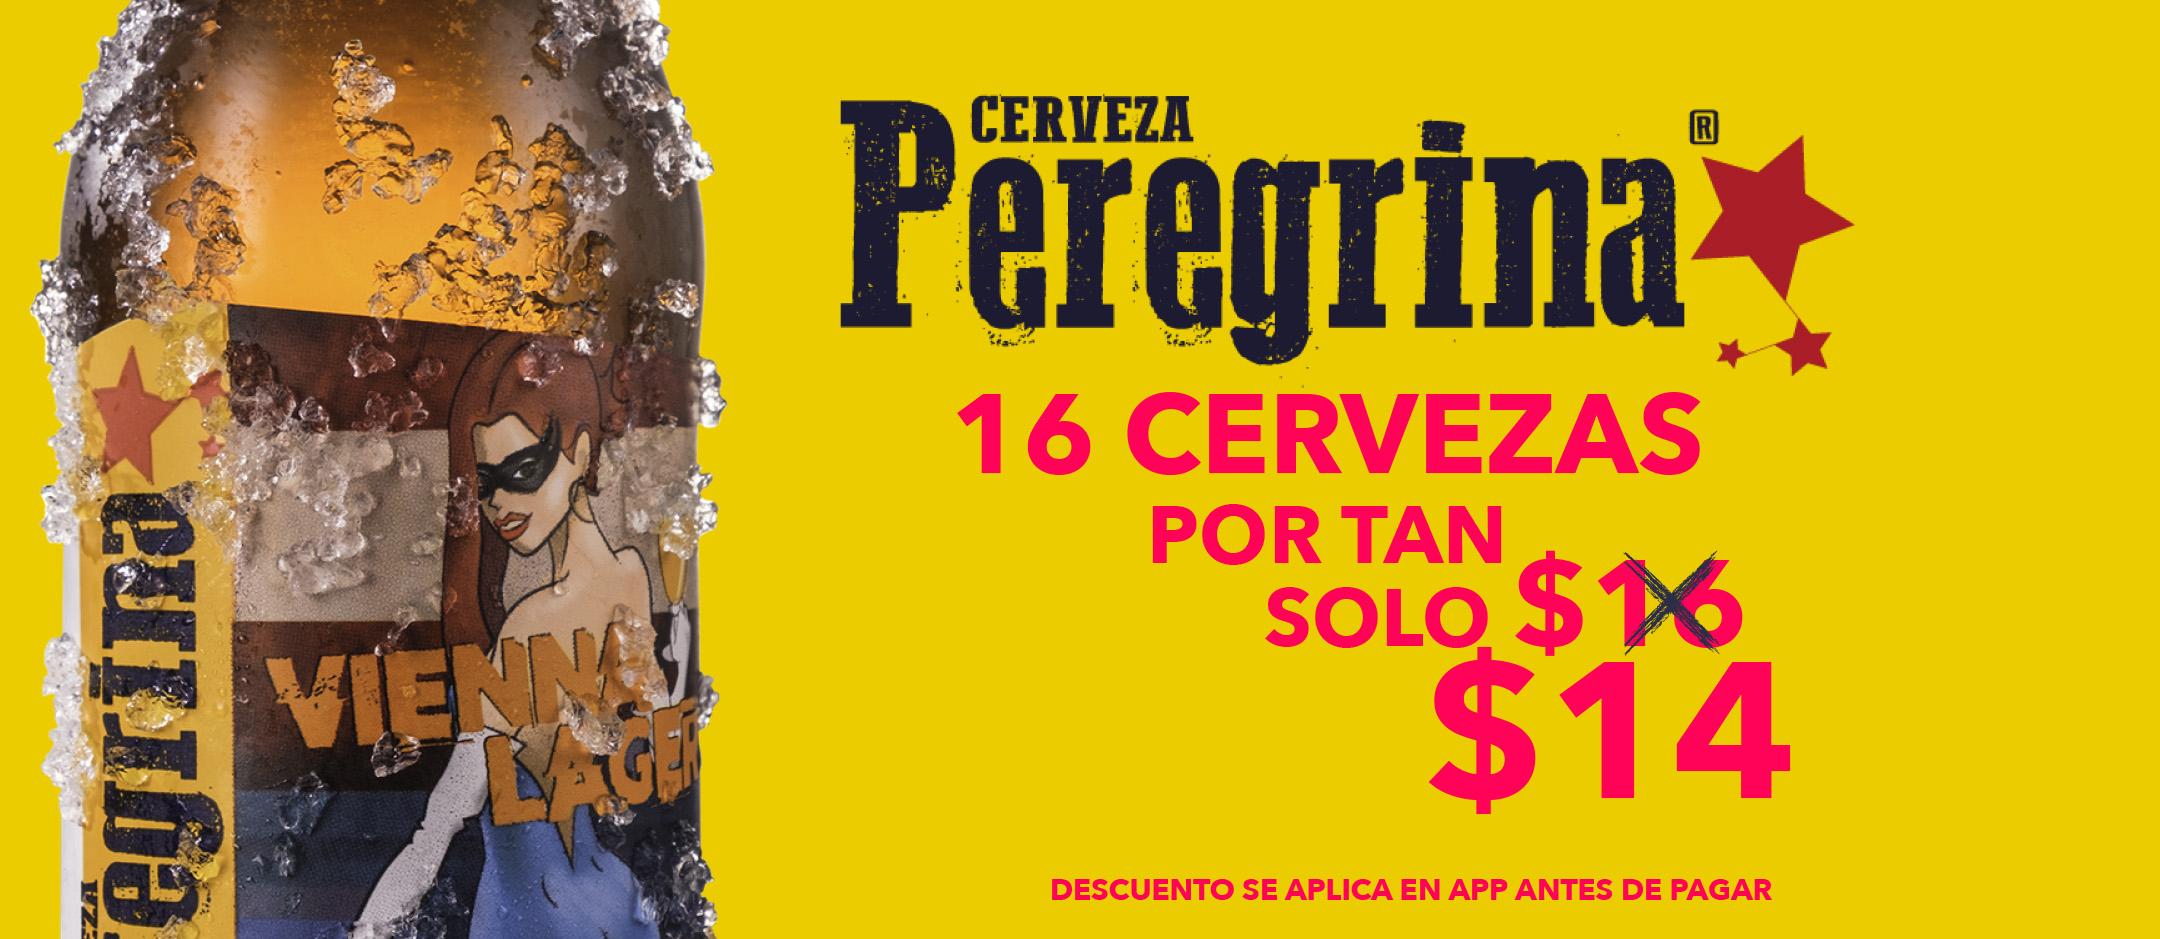 Promo Peregrina